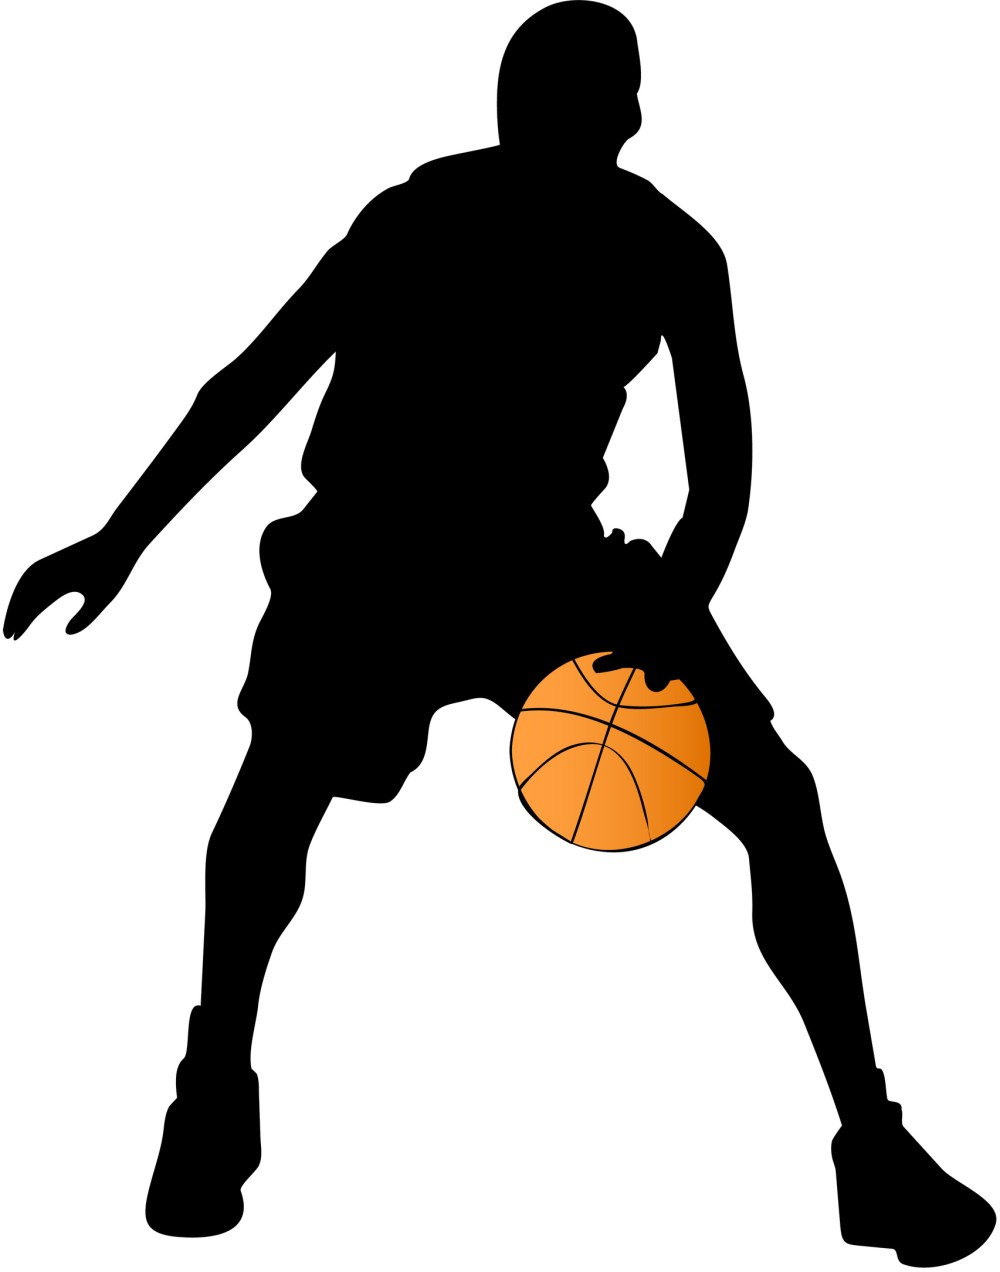 medium resolution of 1705x2170 basketball player clip art many interesting cliparts